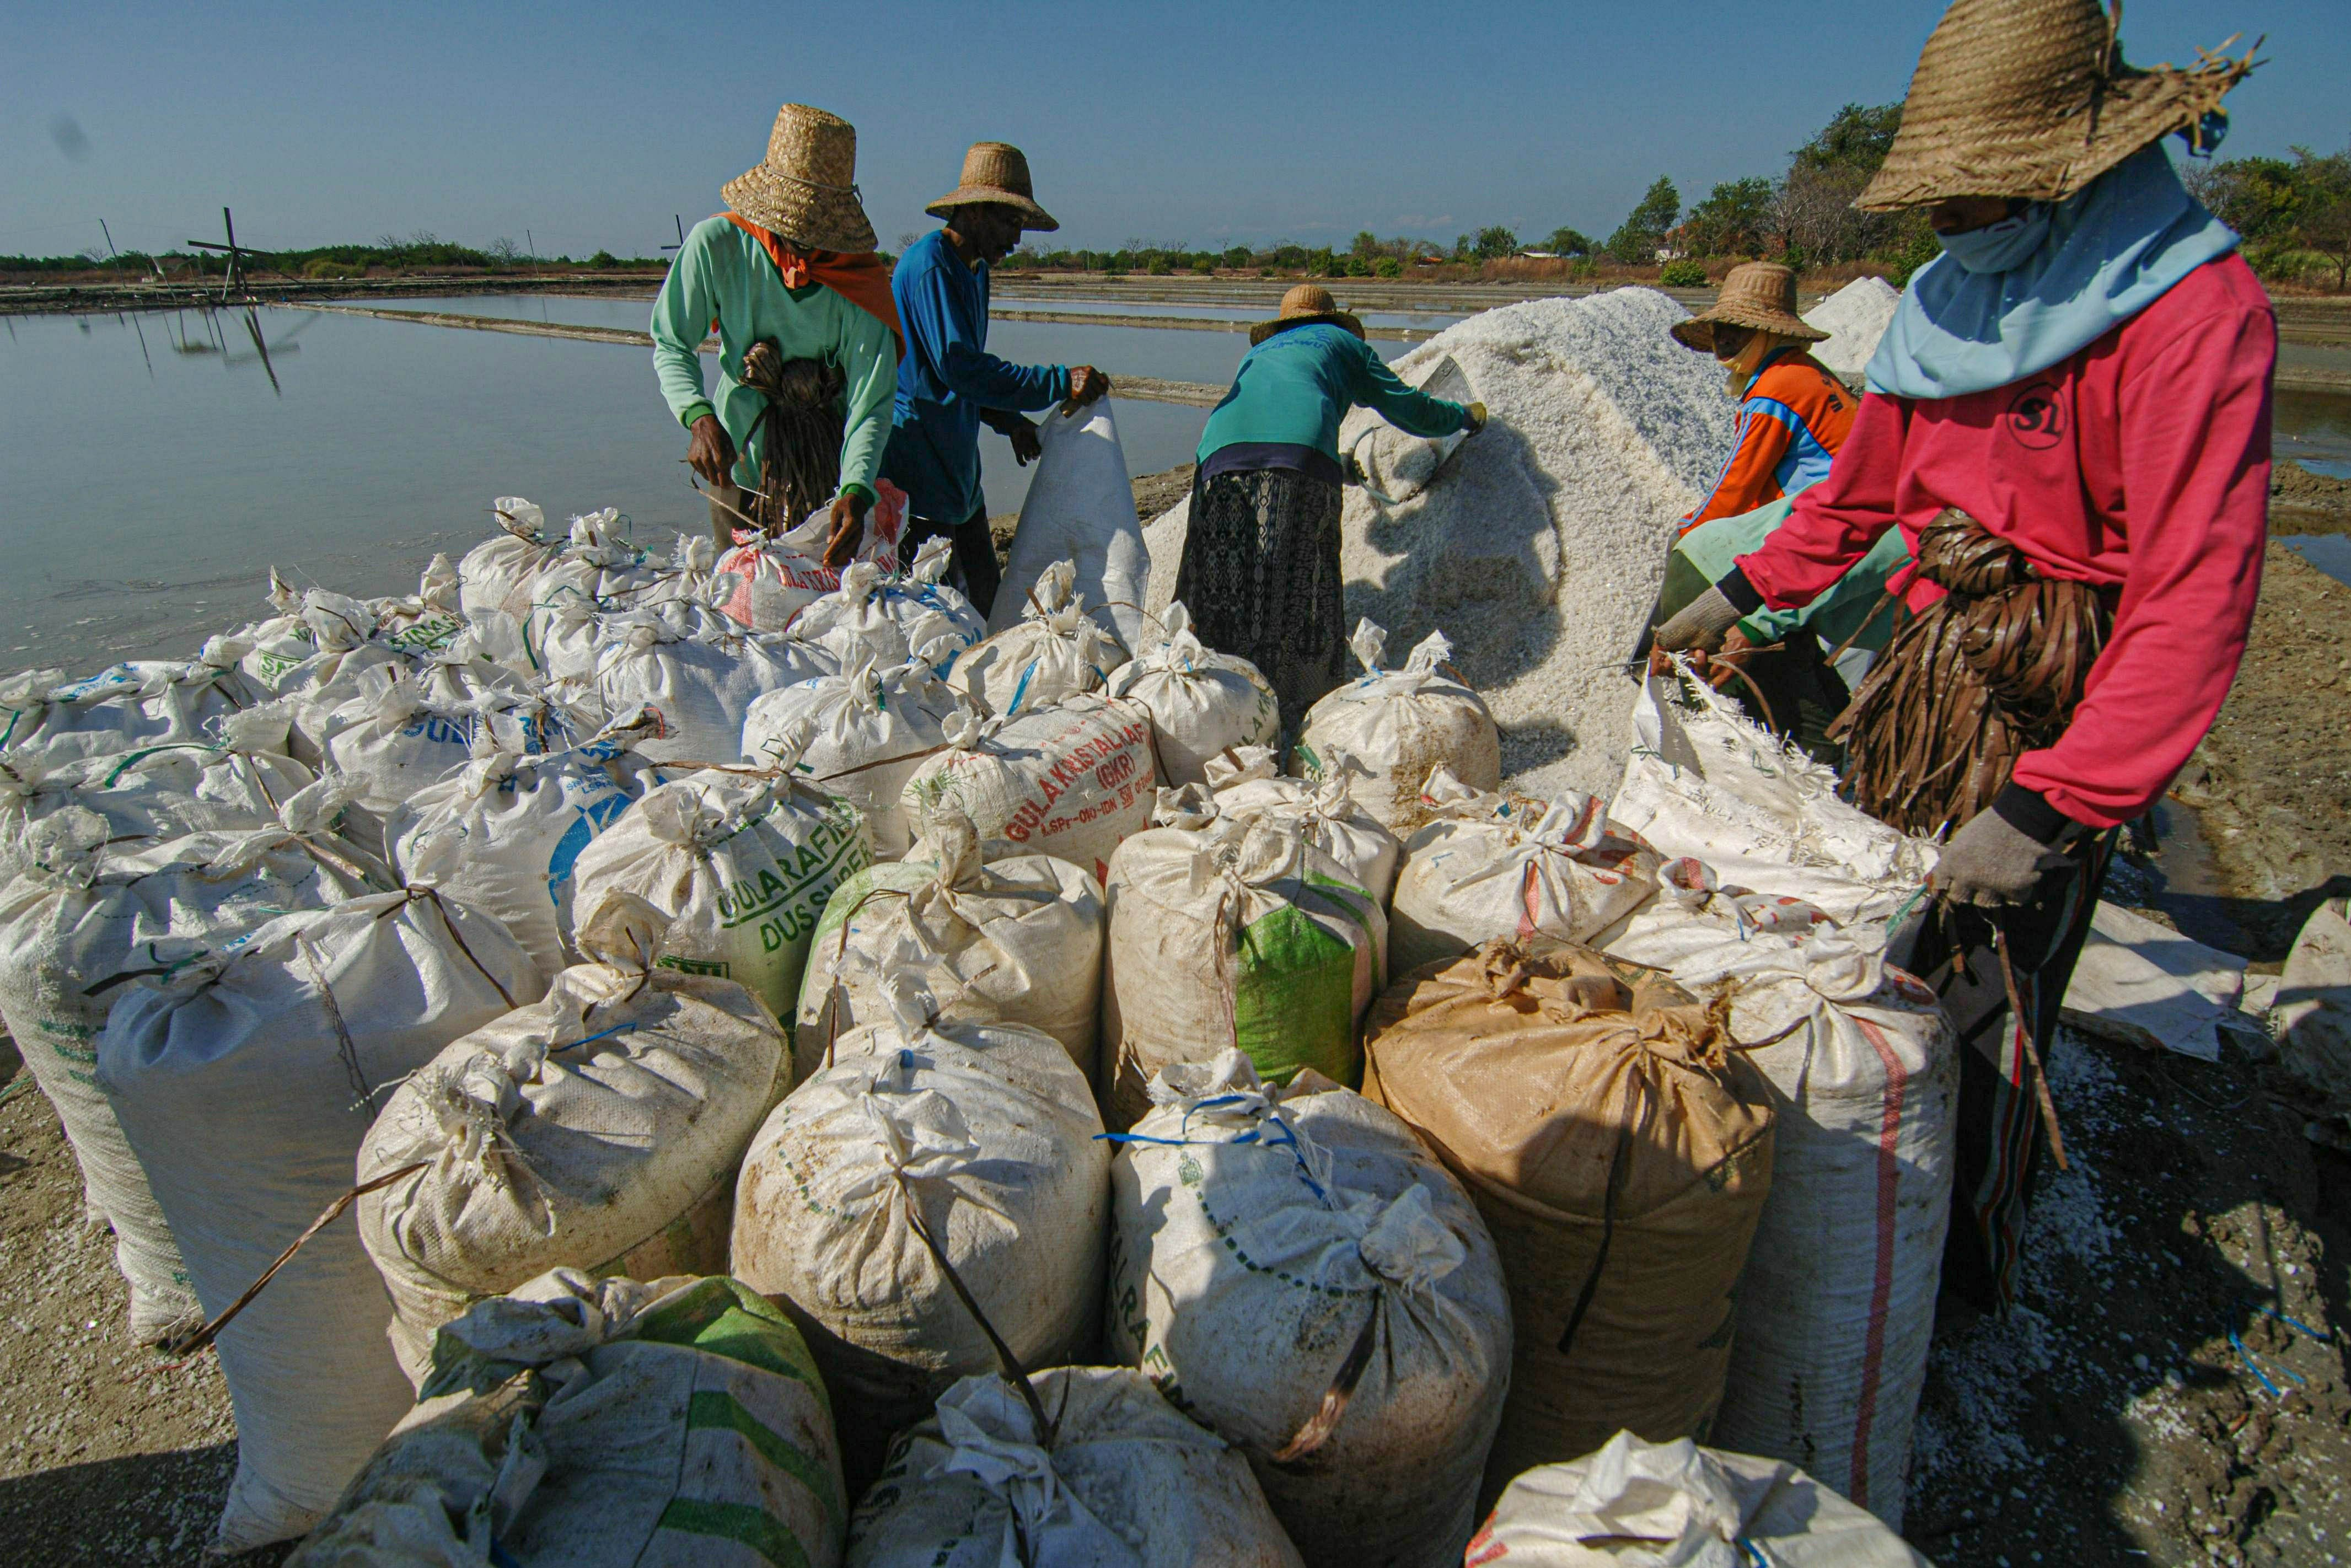 Pekerja mengemas garam ke dalam karung di Desa Bunder, Pademawu, Pamekasan, Jawa Timur.